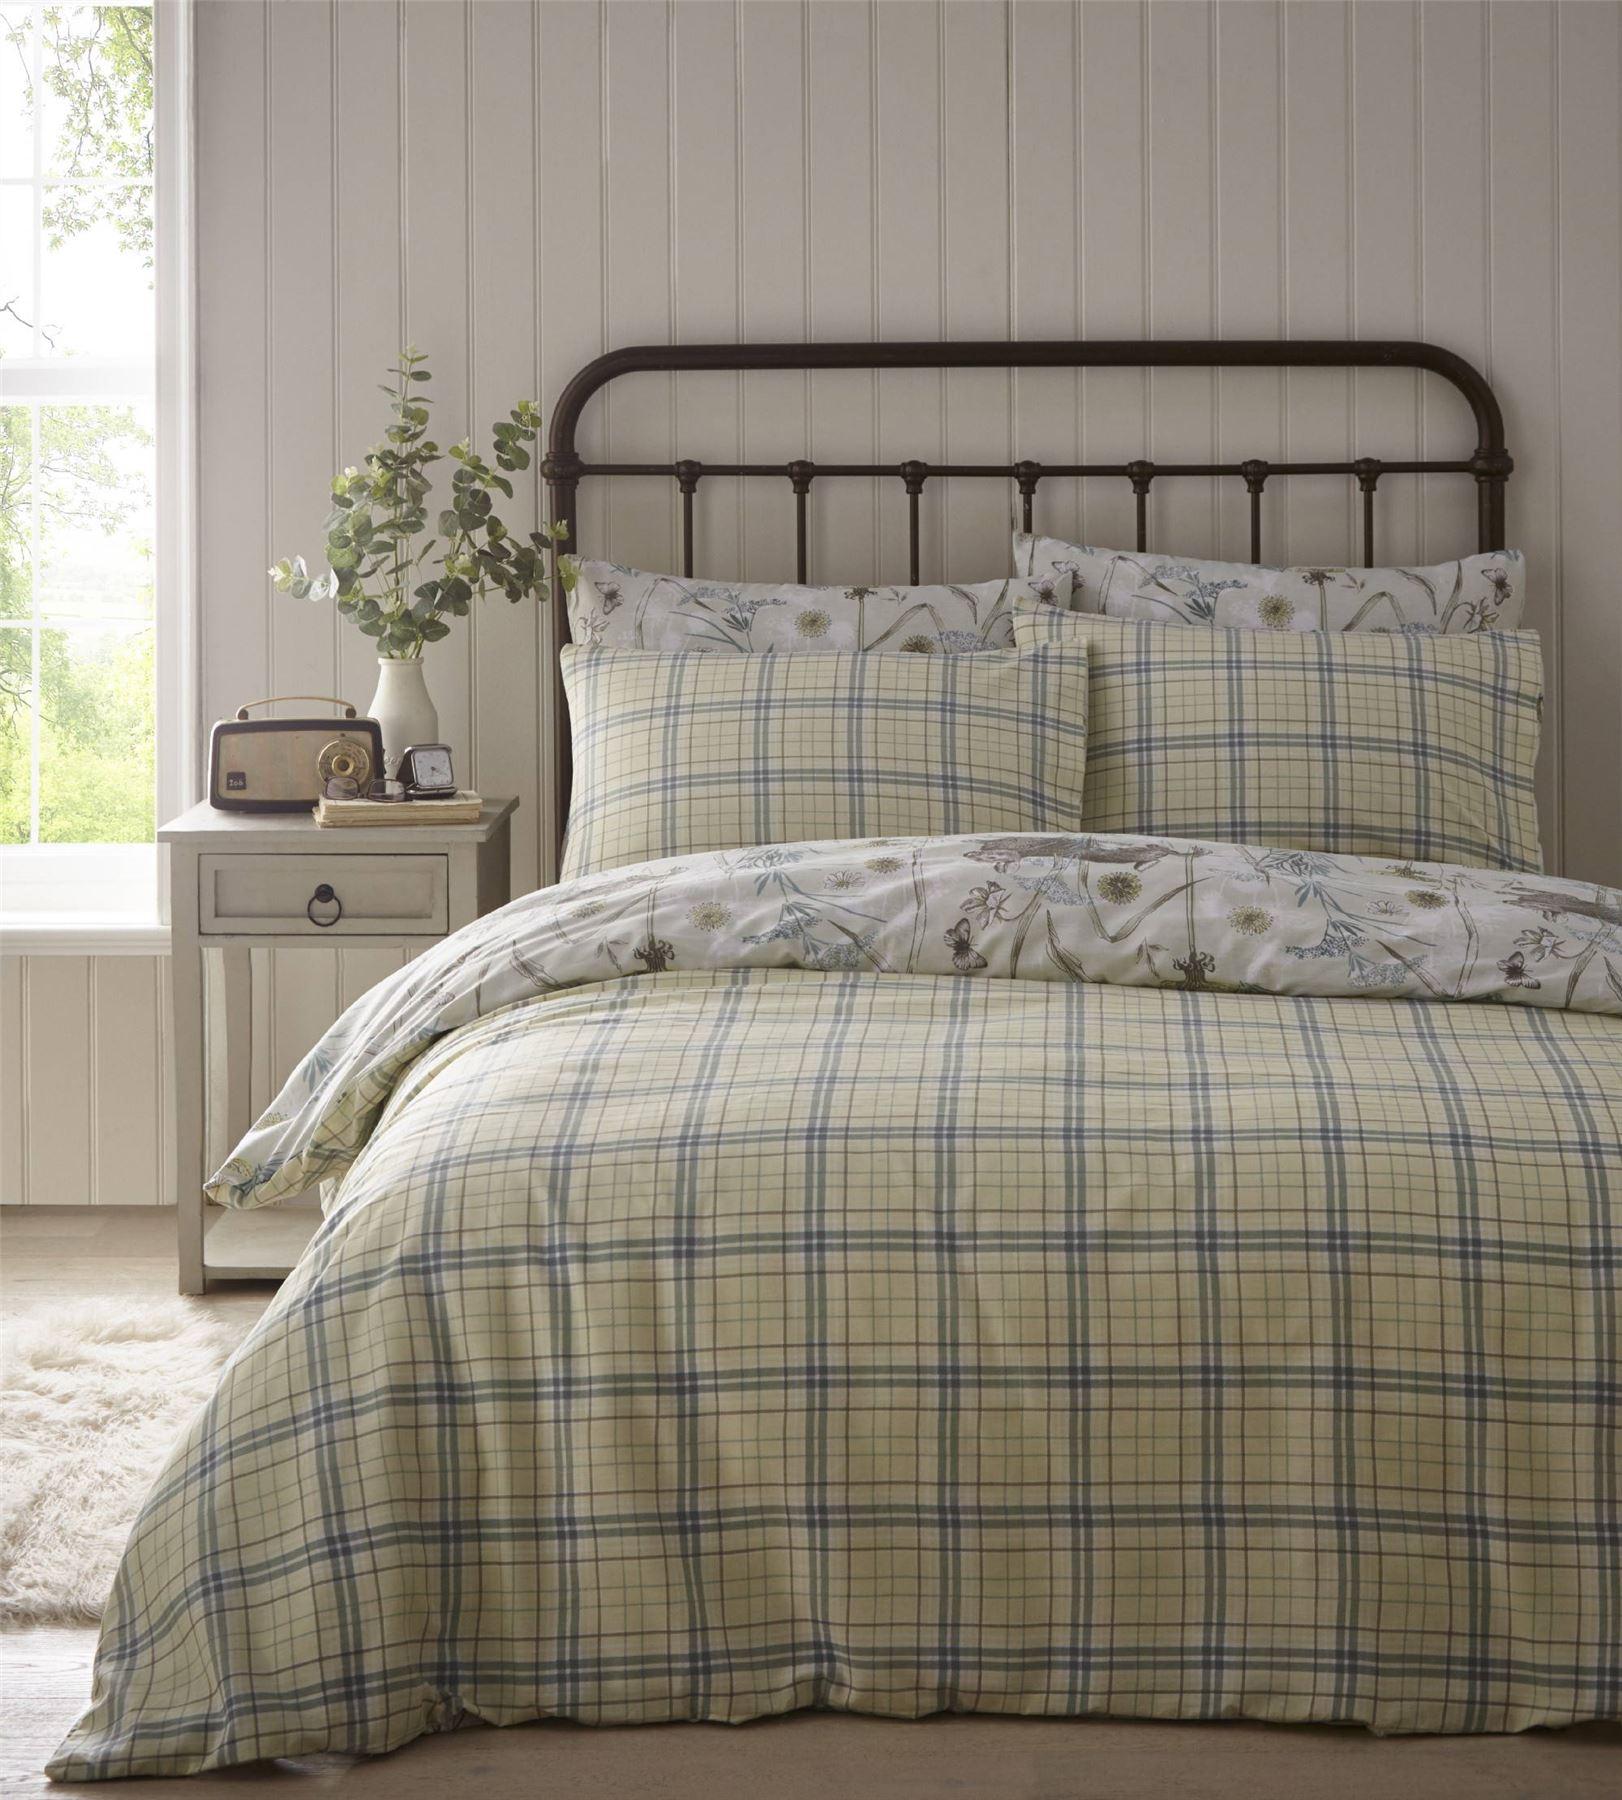 Rabbit-Meadow-Animals-Reversible-Check-Tartan-Duvet-Cover-Bedding-Bed-Set thumbnail 3